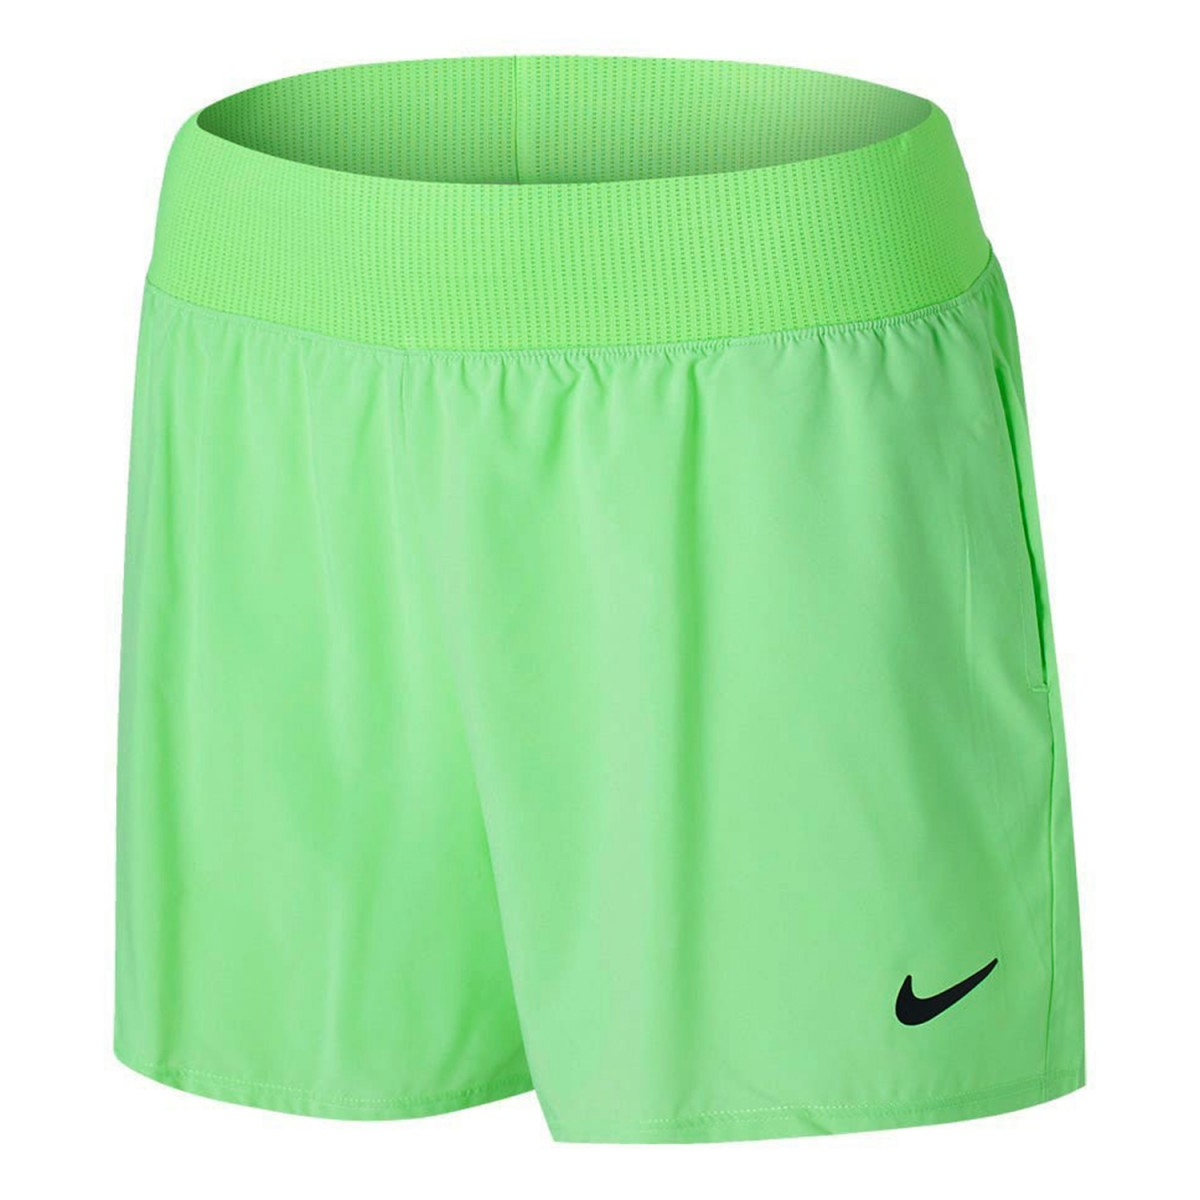 Теннисные шорты женские Nike Court Victory Short W lime glow/black